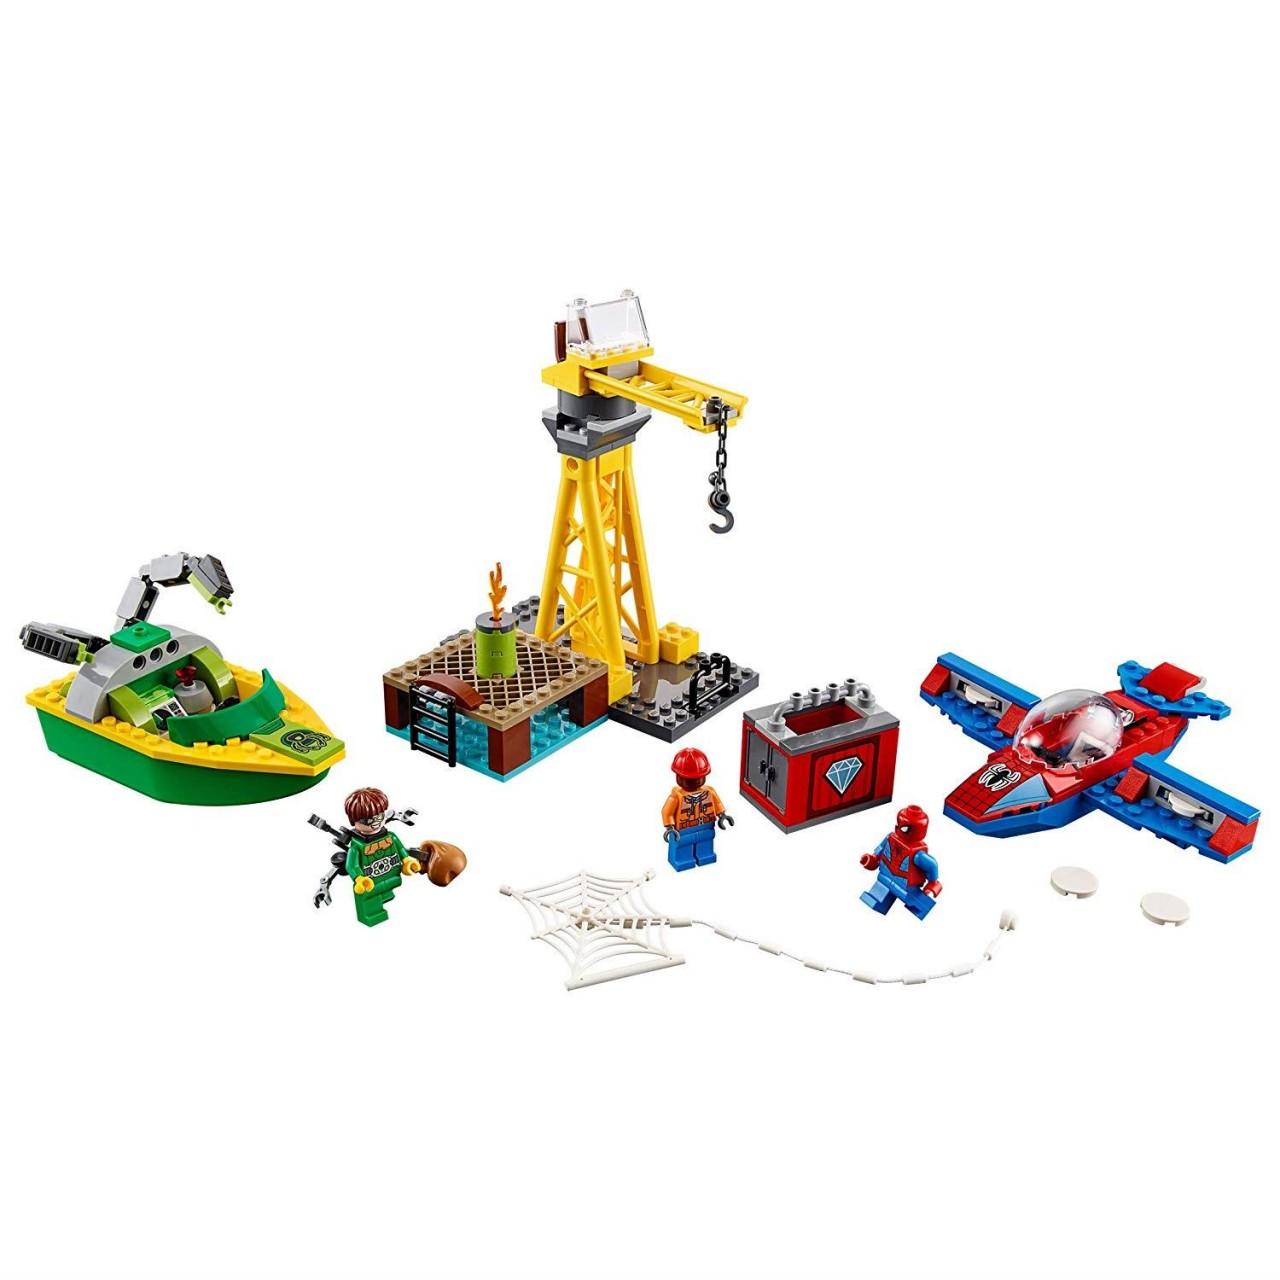 LEGO MARVEL SUPER HEROES 76134 Spider-Man Diamantenraub mit Doc Ock